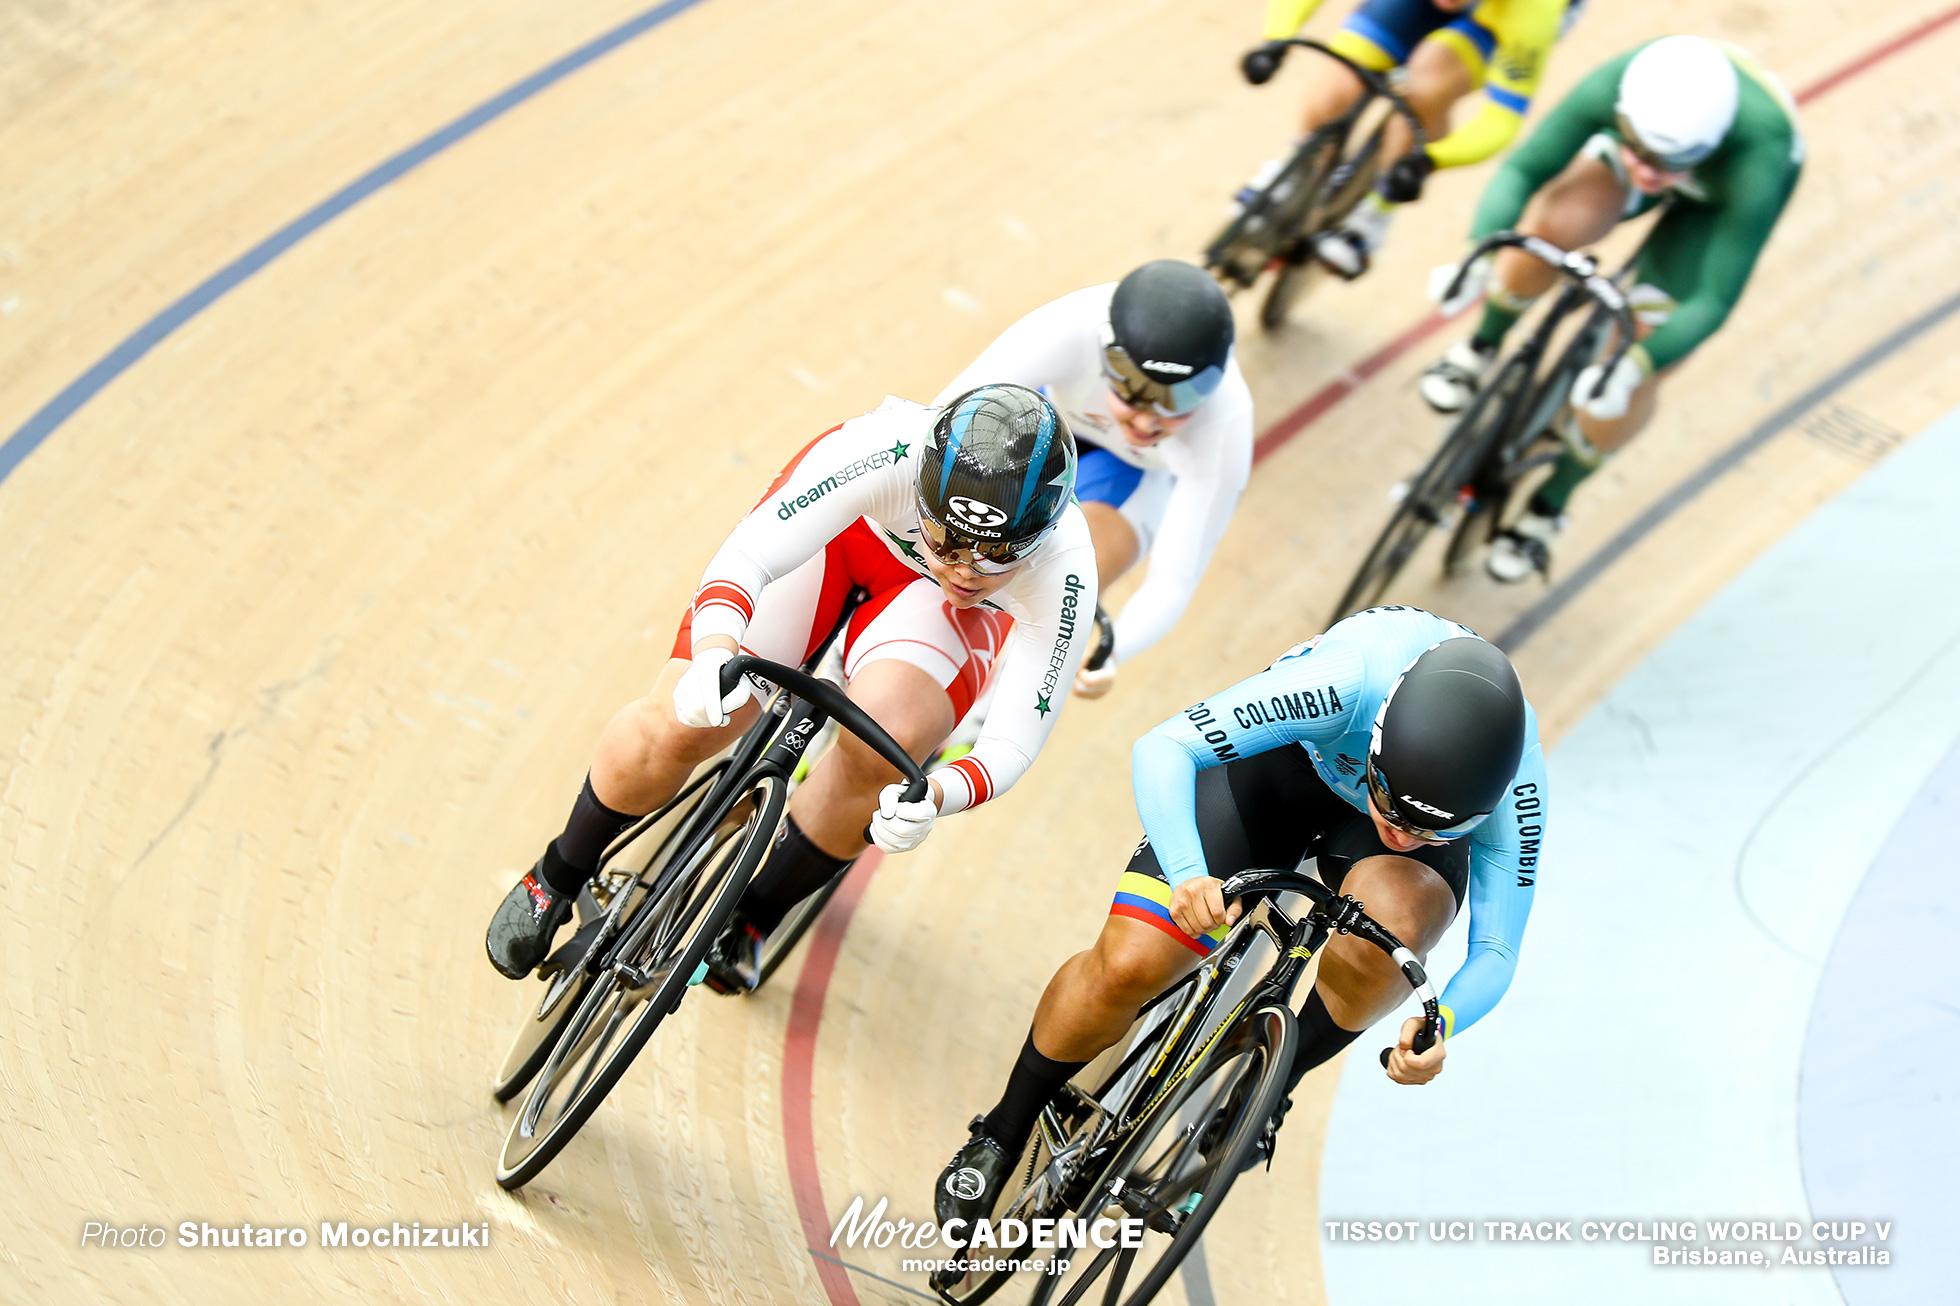 1st Round / Women's Keirin / TISSOT UCI TRACK CYCLING WORLD CUP V, Brisbane, Australia